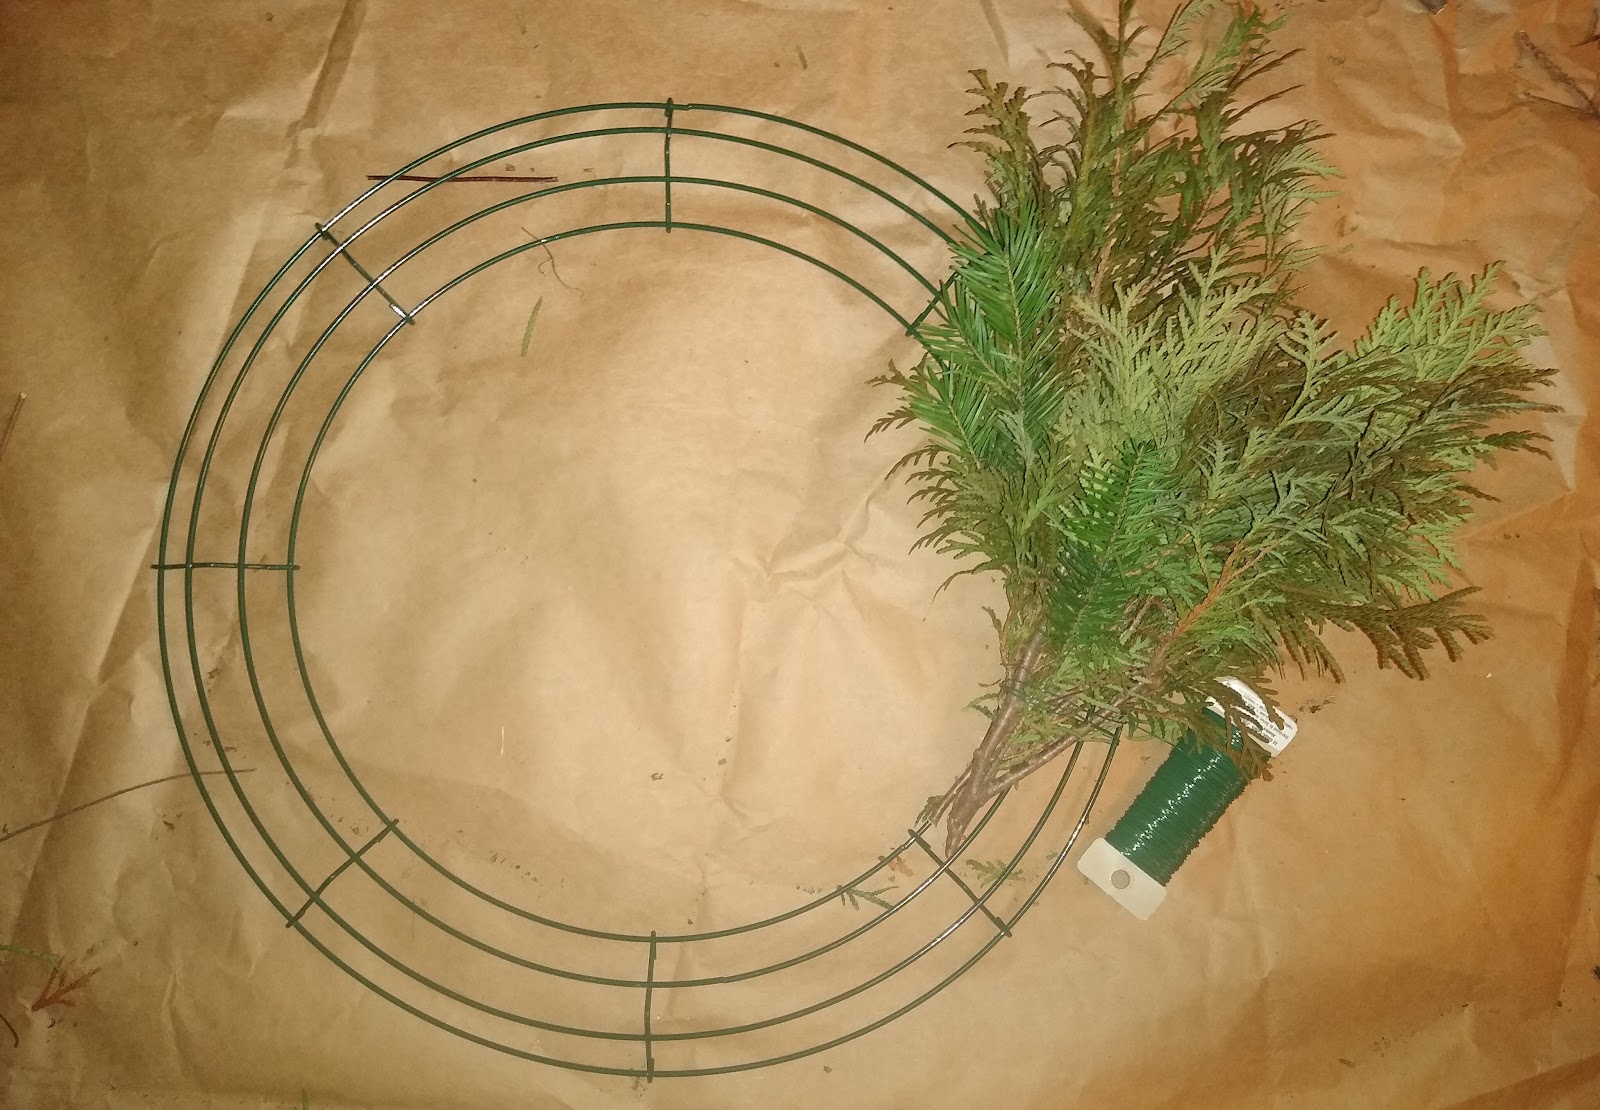 greenery bundles on Christmas wreath